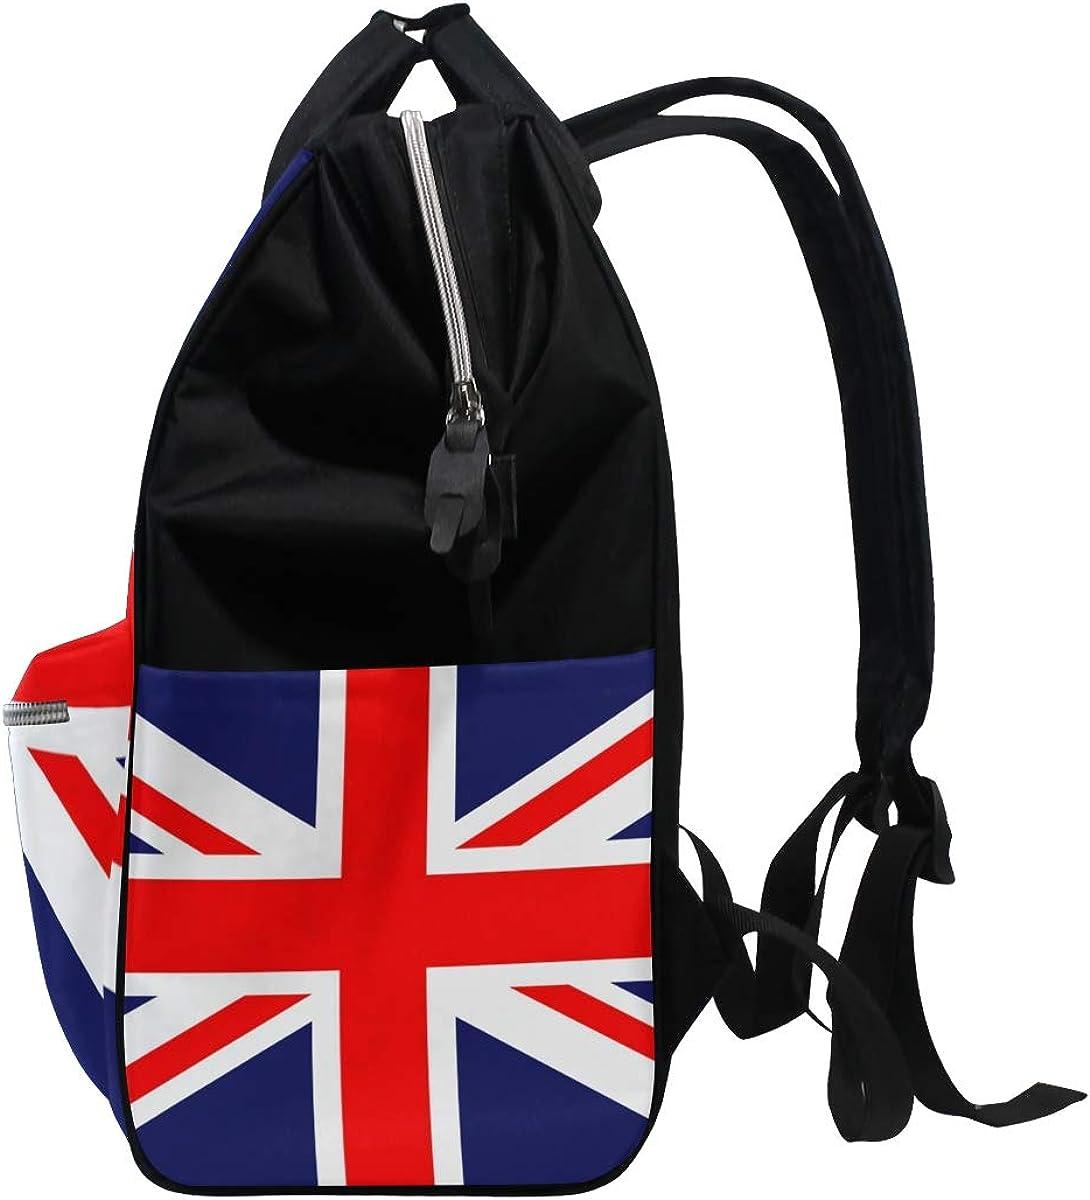 imobaby Union Jack Flag Changing Bags Large Capacity Handbags Canvas Shoulder Bag Backpack